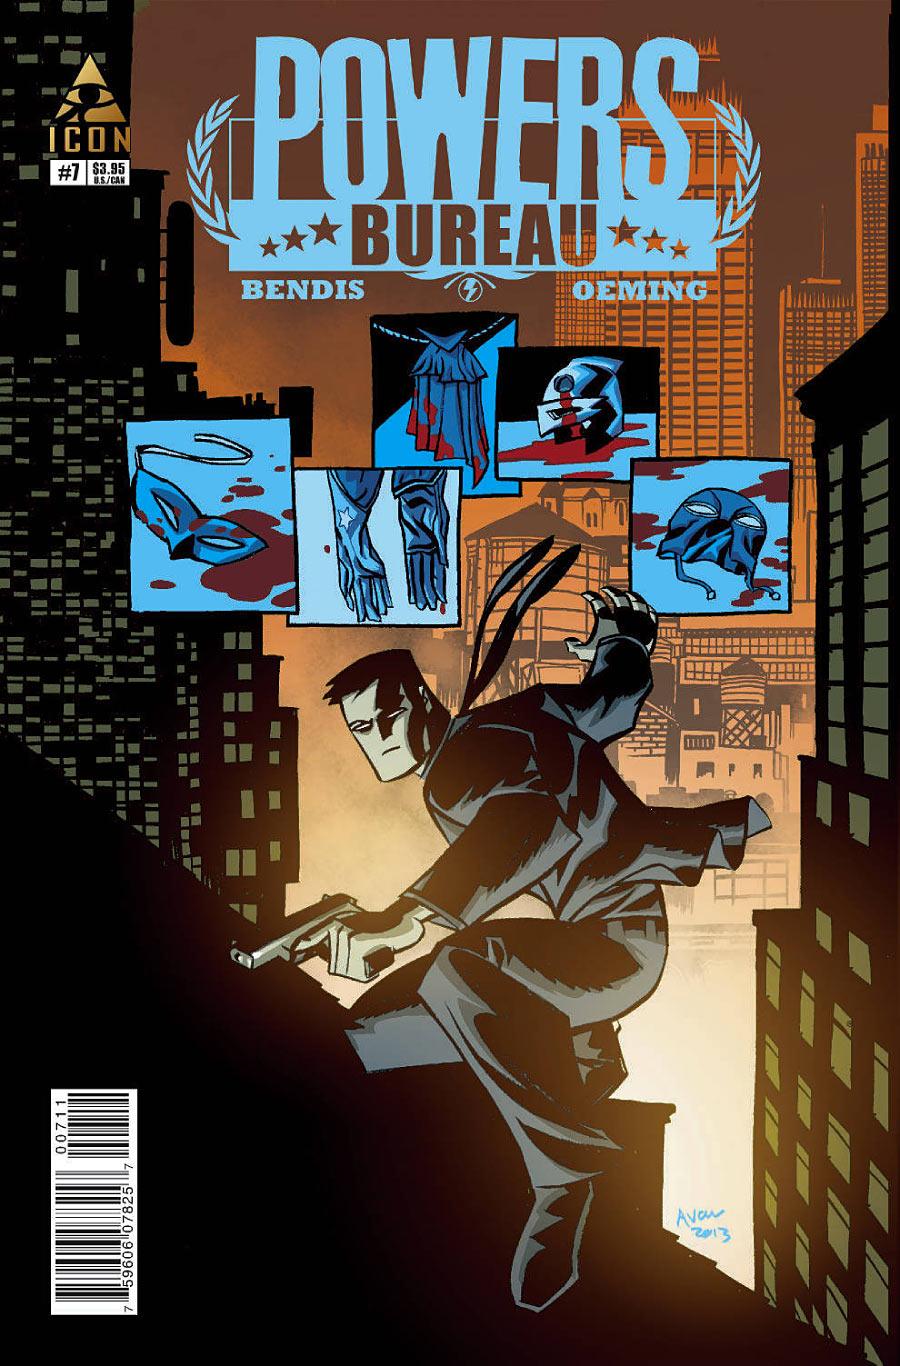 Powers: Bureau Vol 1 7